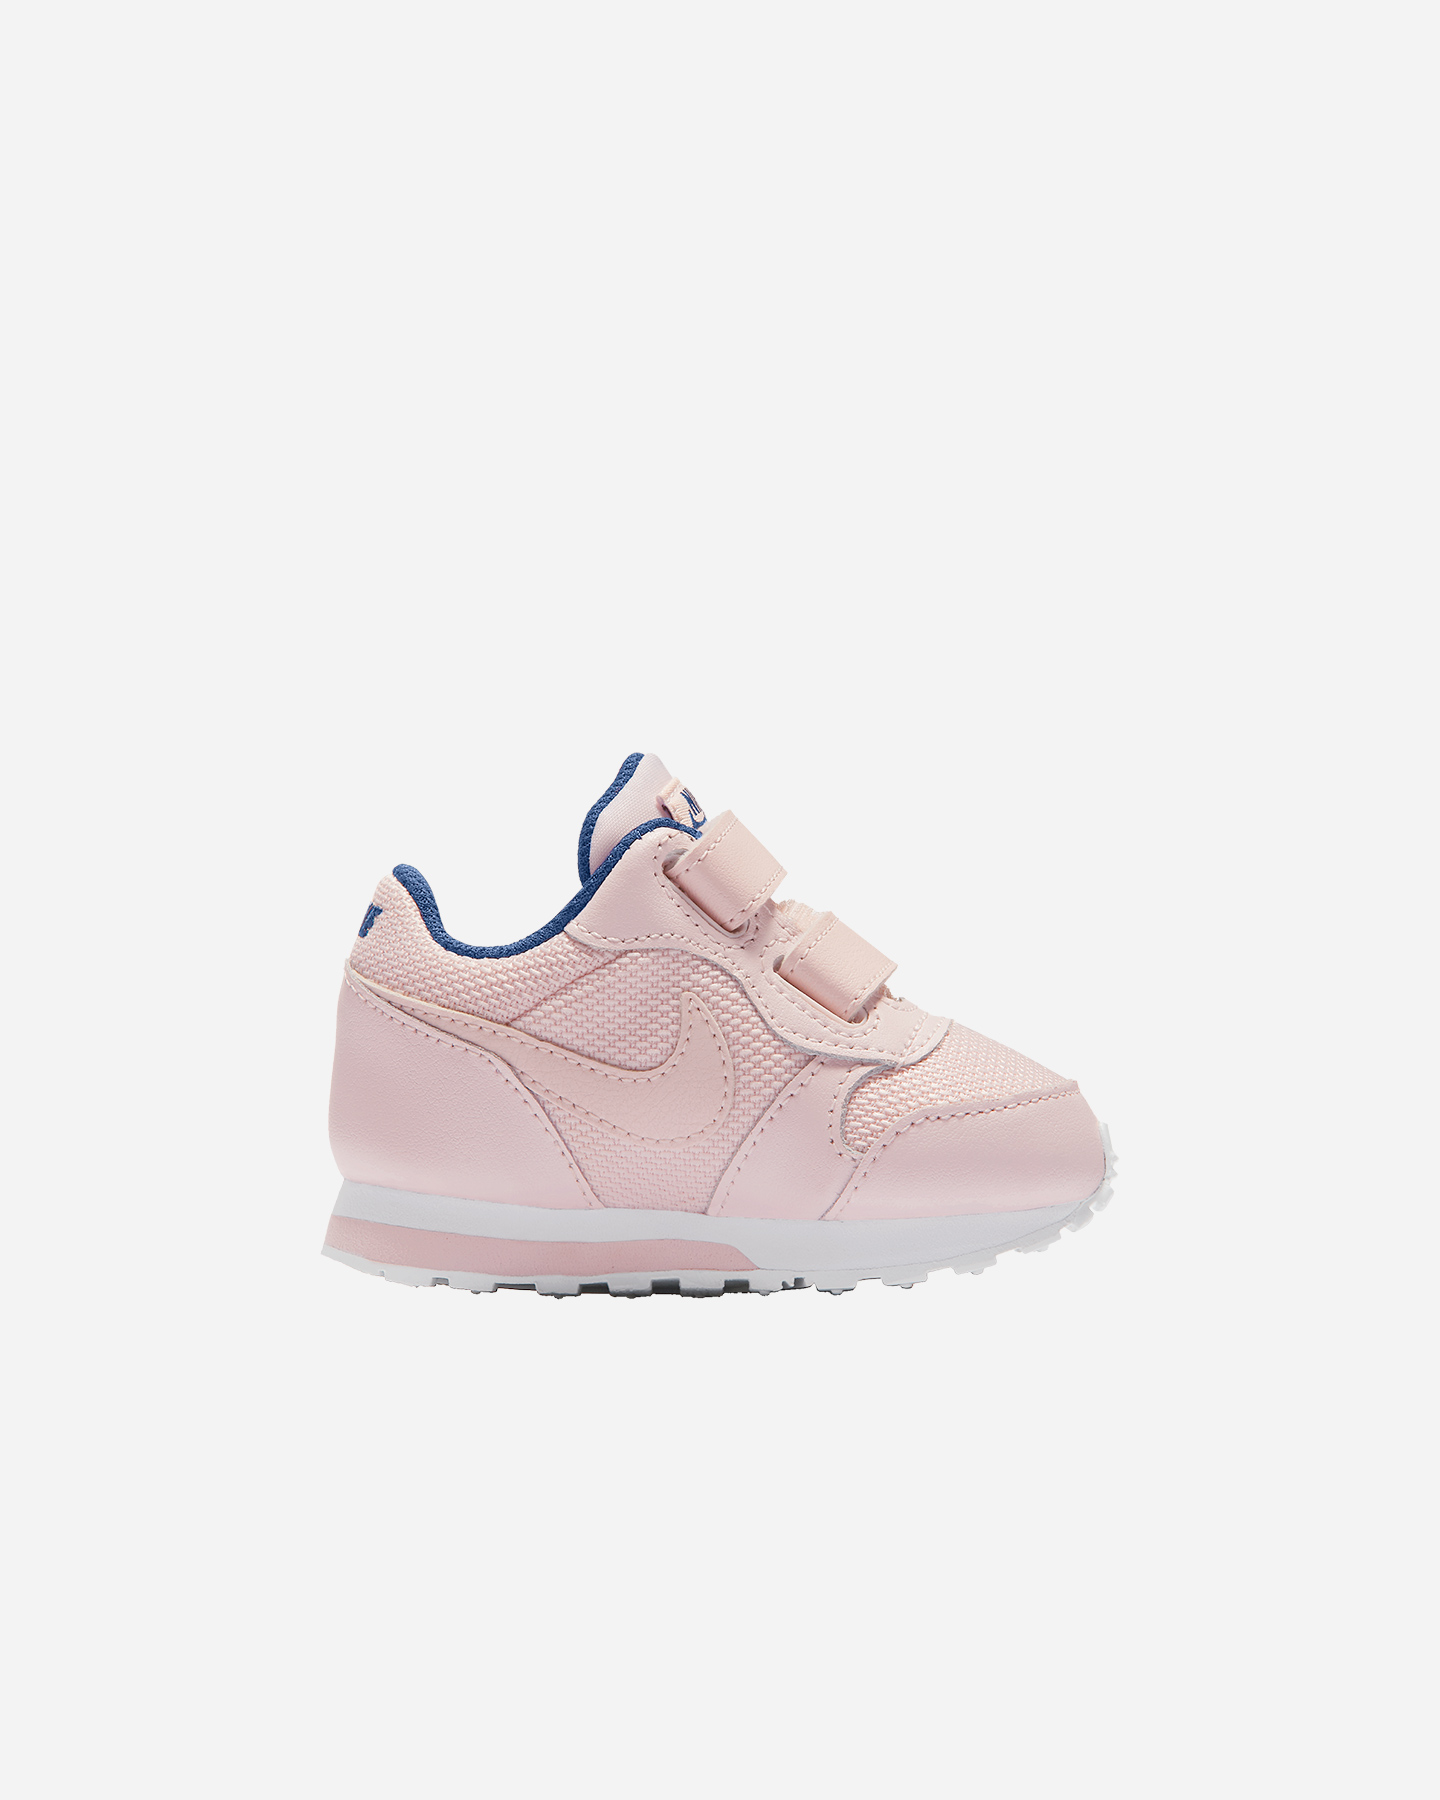 1a79d652c990 Scarpe Sportive Nike Md Runner 2 (Tdv) Jr 807328-600 | Cisalfa Sport